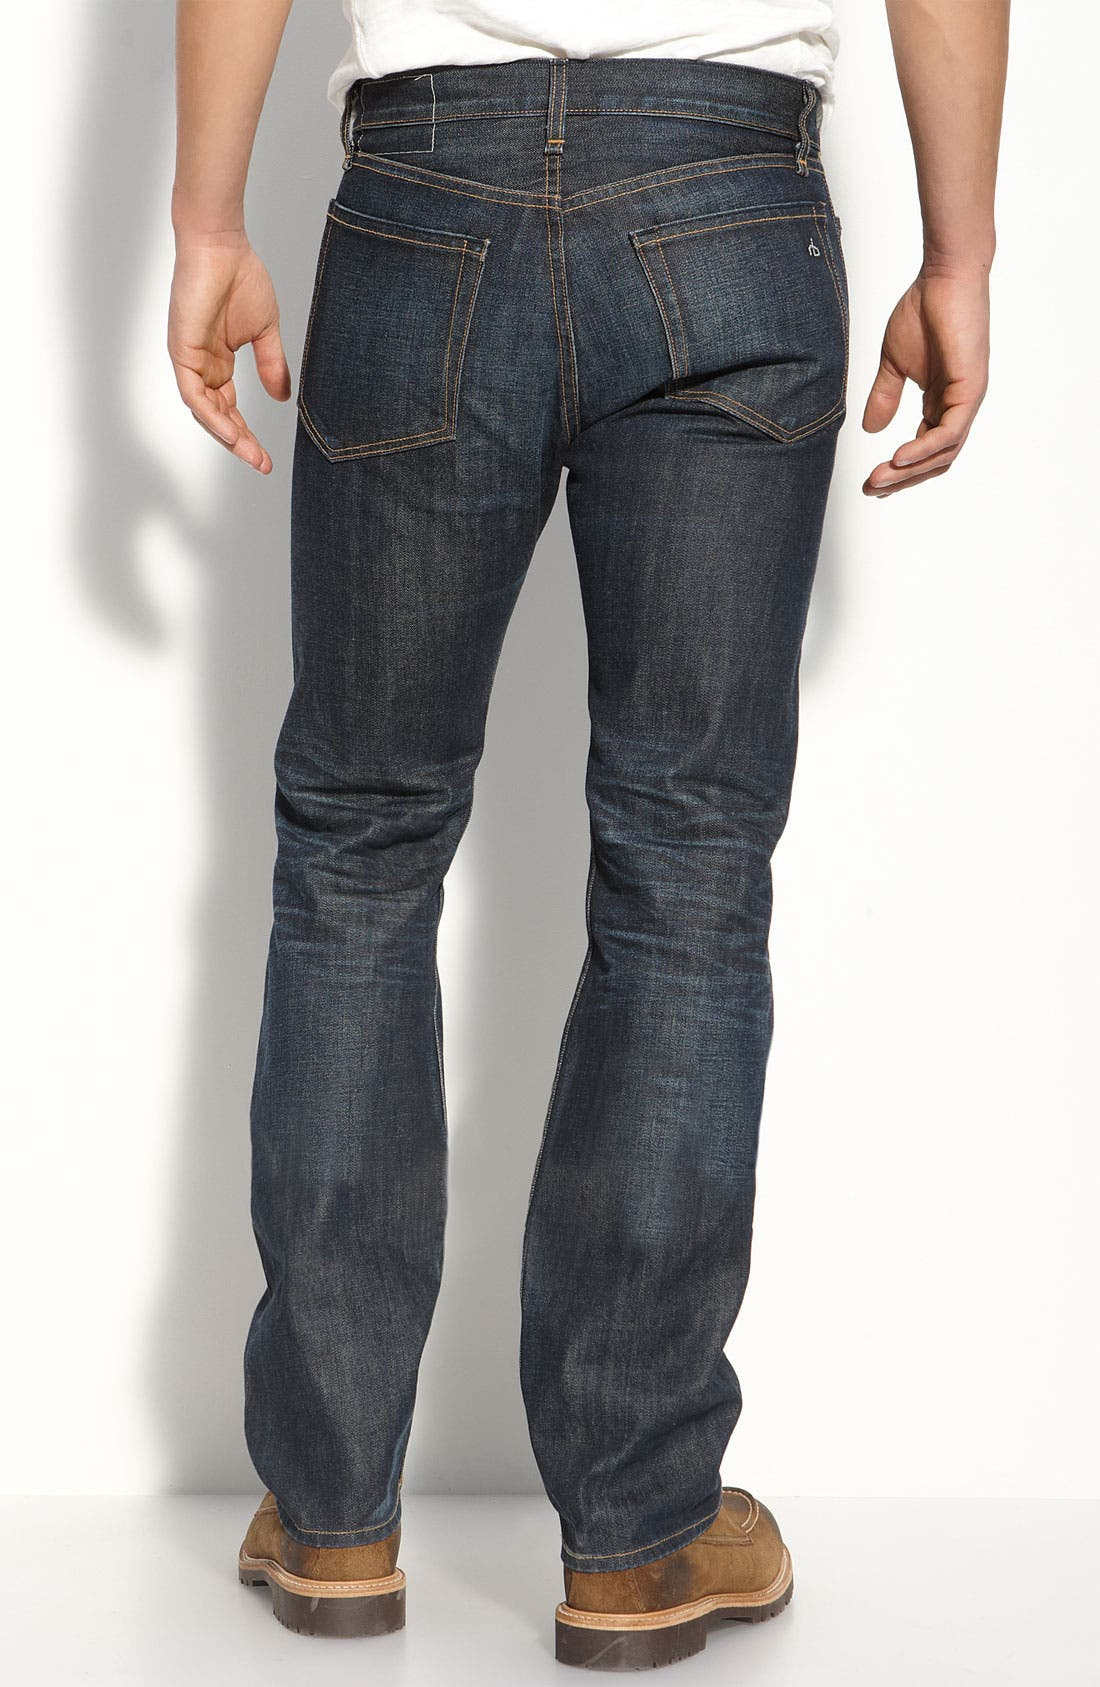 Alternate Image 1 Selected - rag & bone 'RB11X' Straight Leg Jeans (Dover Wash)